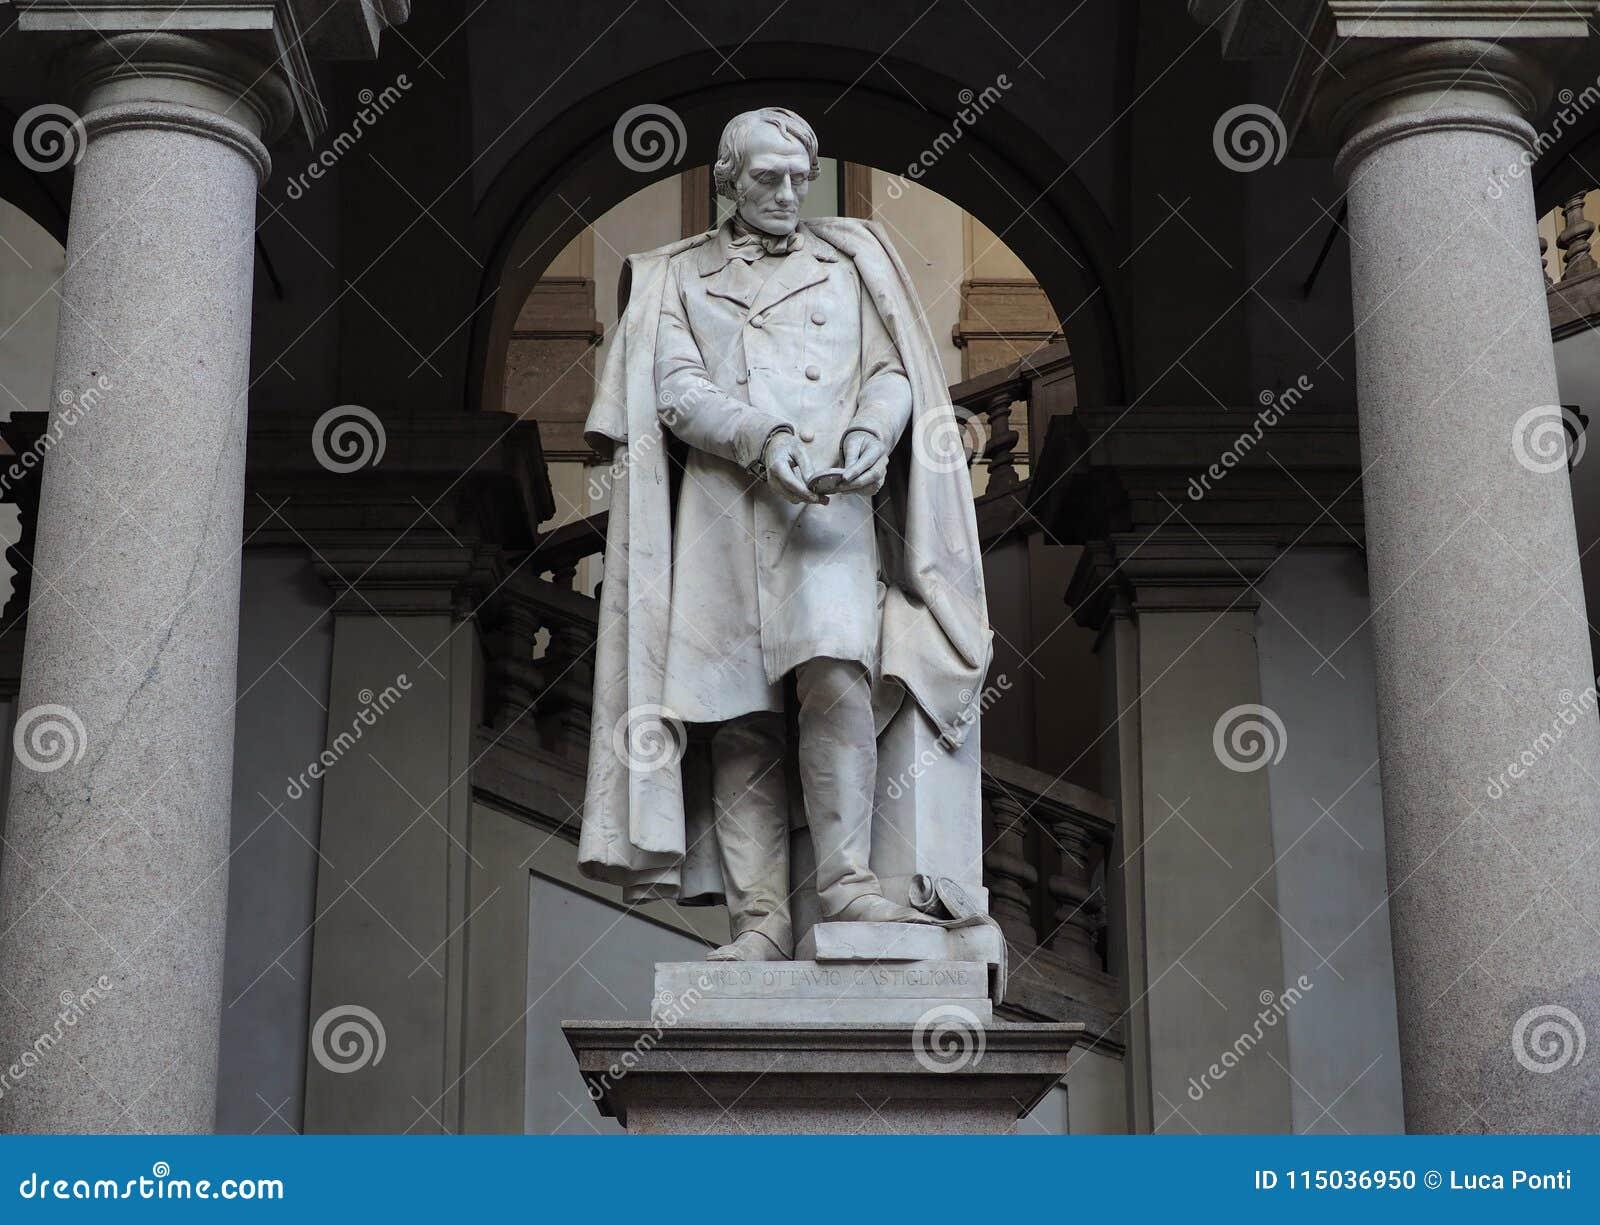 Estátua de Carlo Ottavio Castiglioni